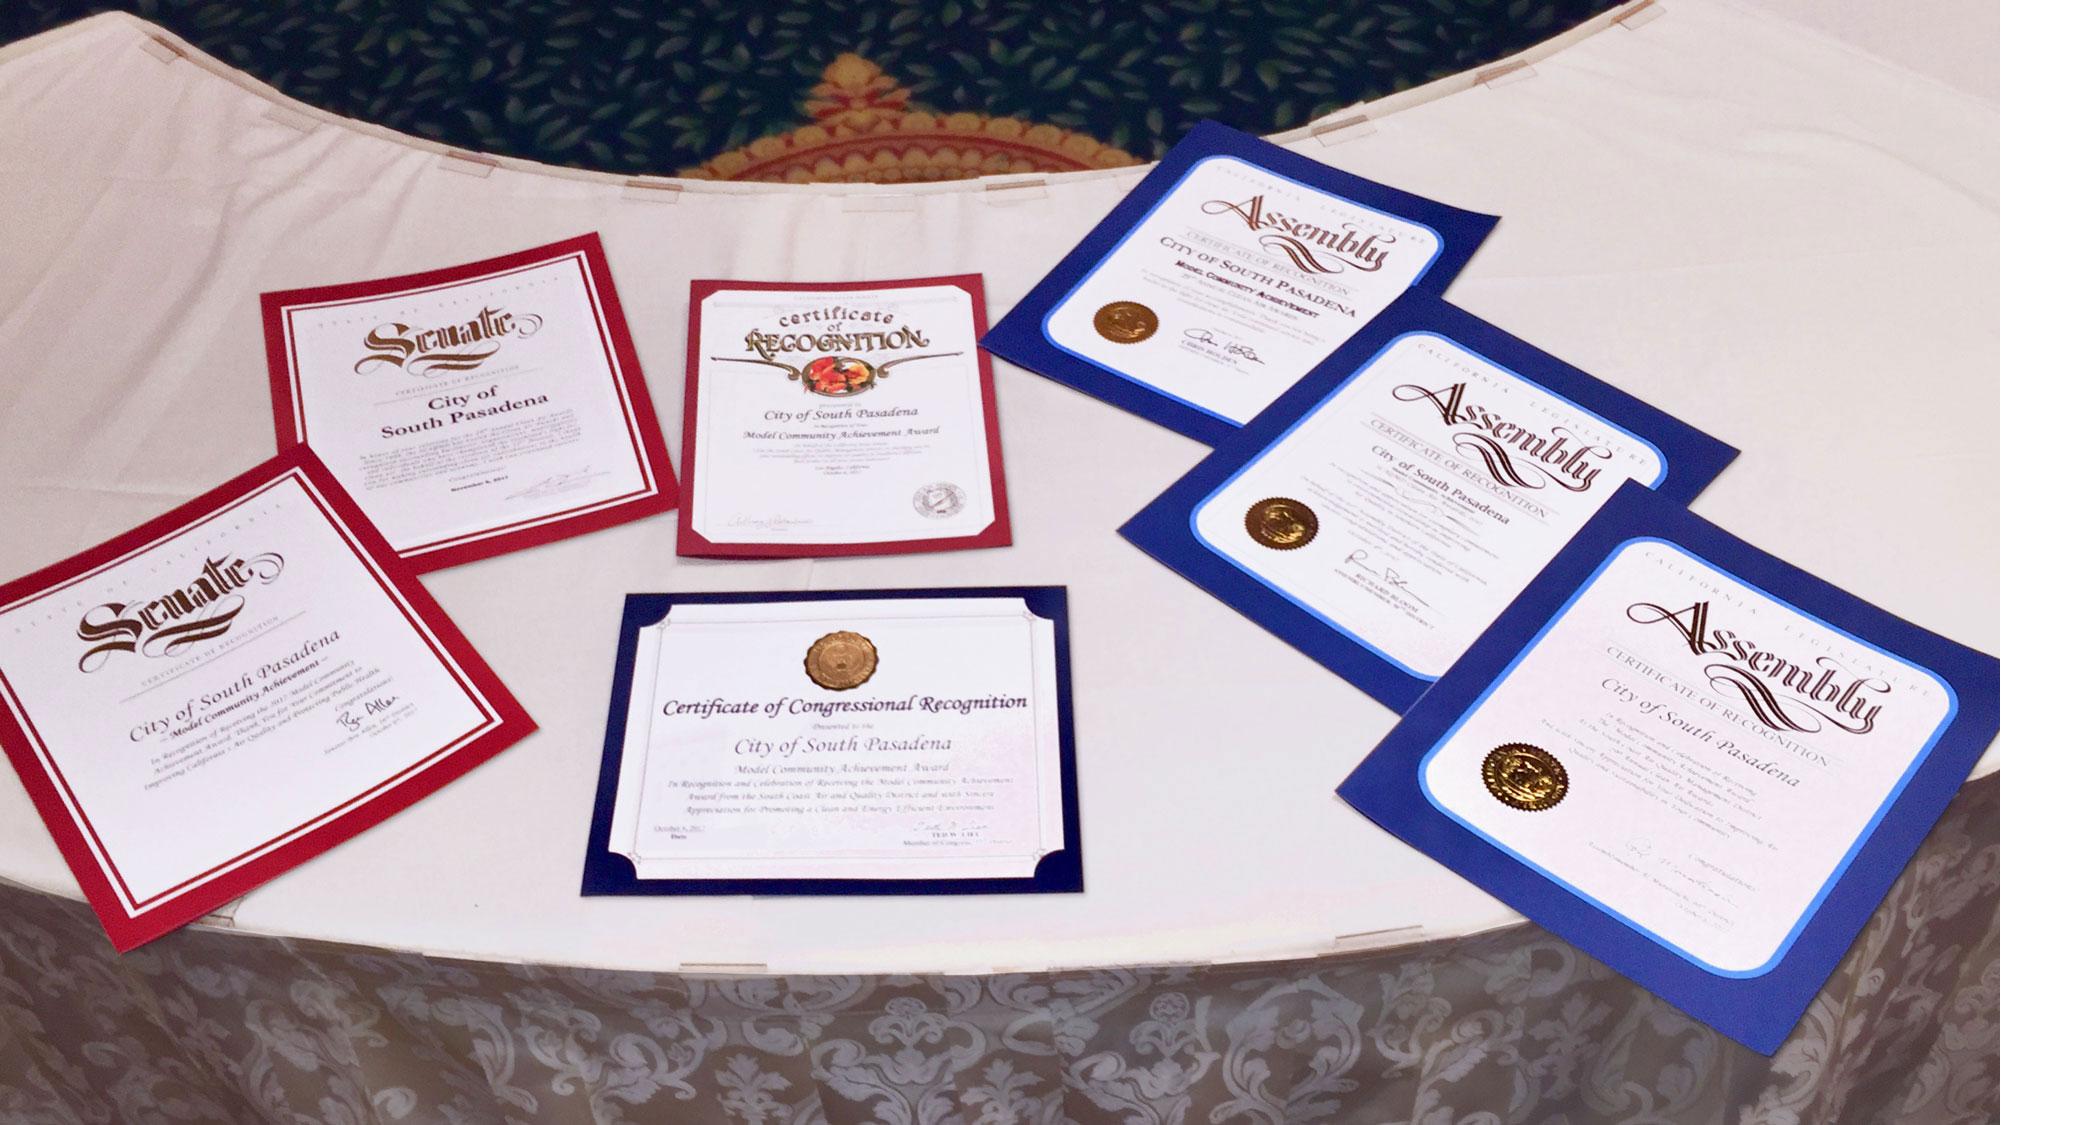 AGZA_PIX_SCAQMD_Clean_Air_Awards_12_Certificate_02_2000+MARGIN.jpg